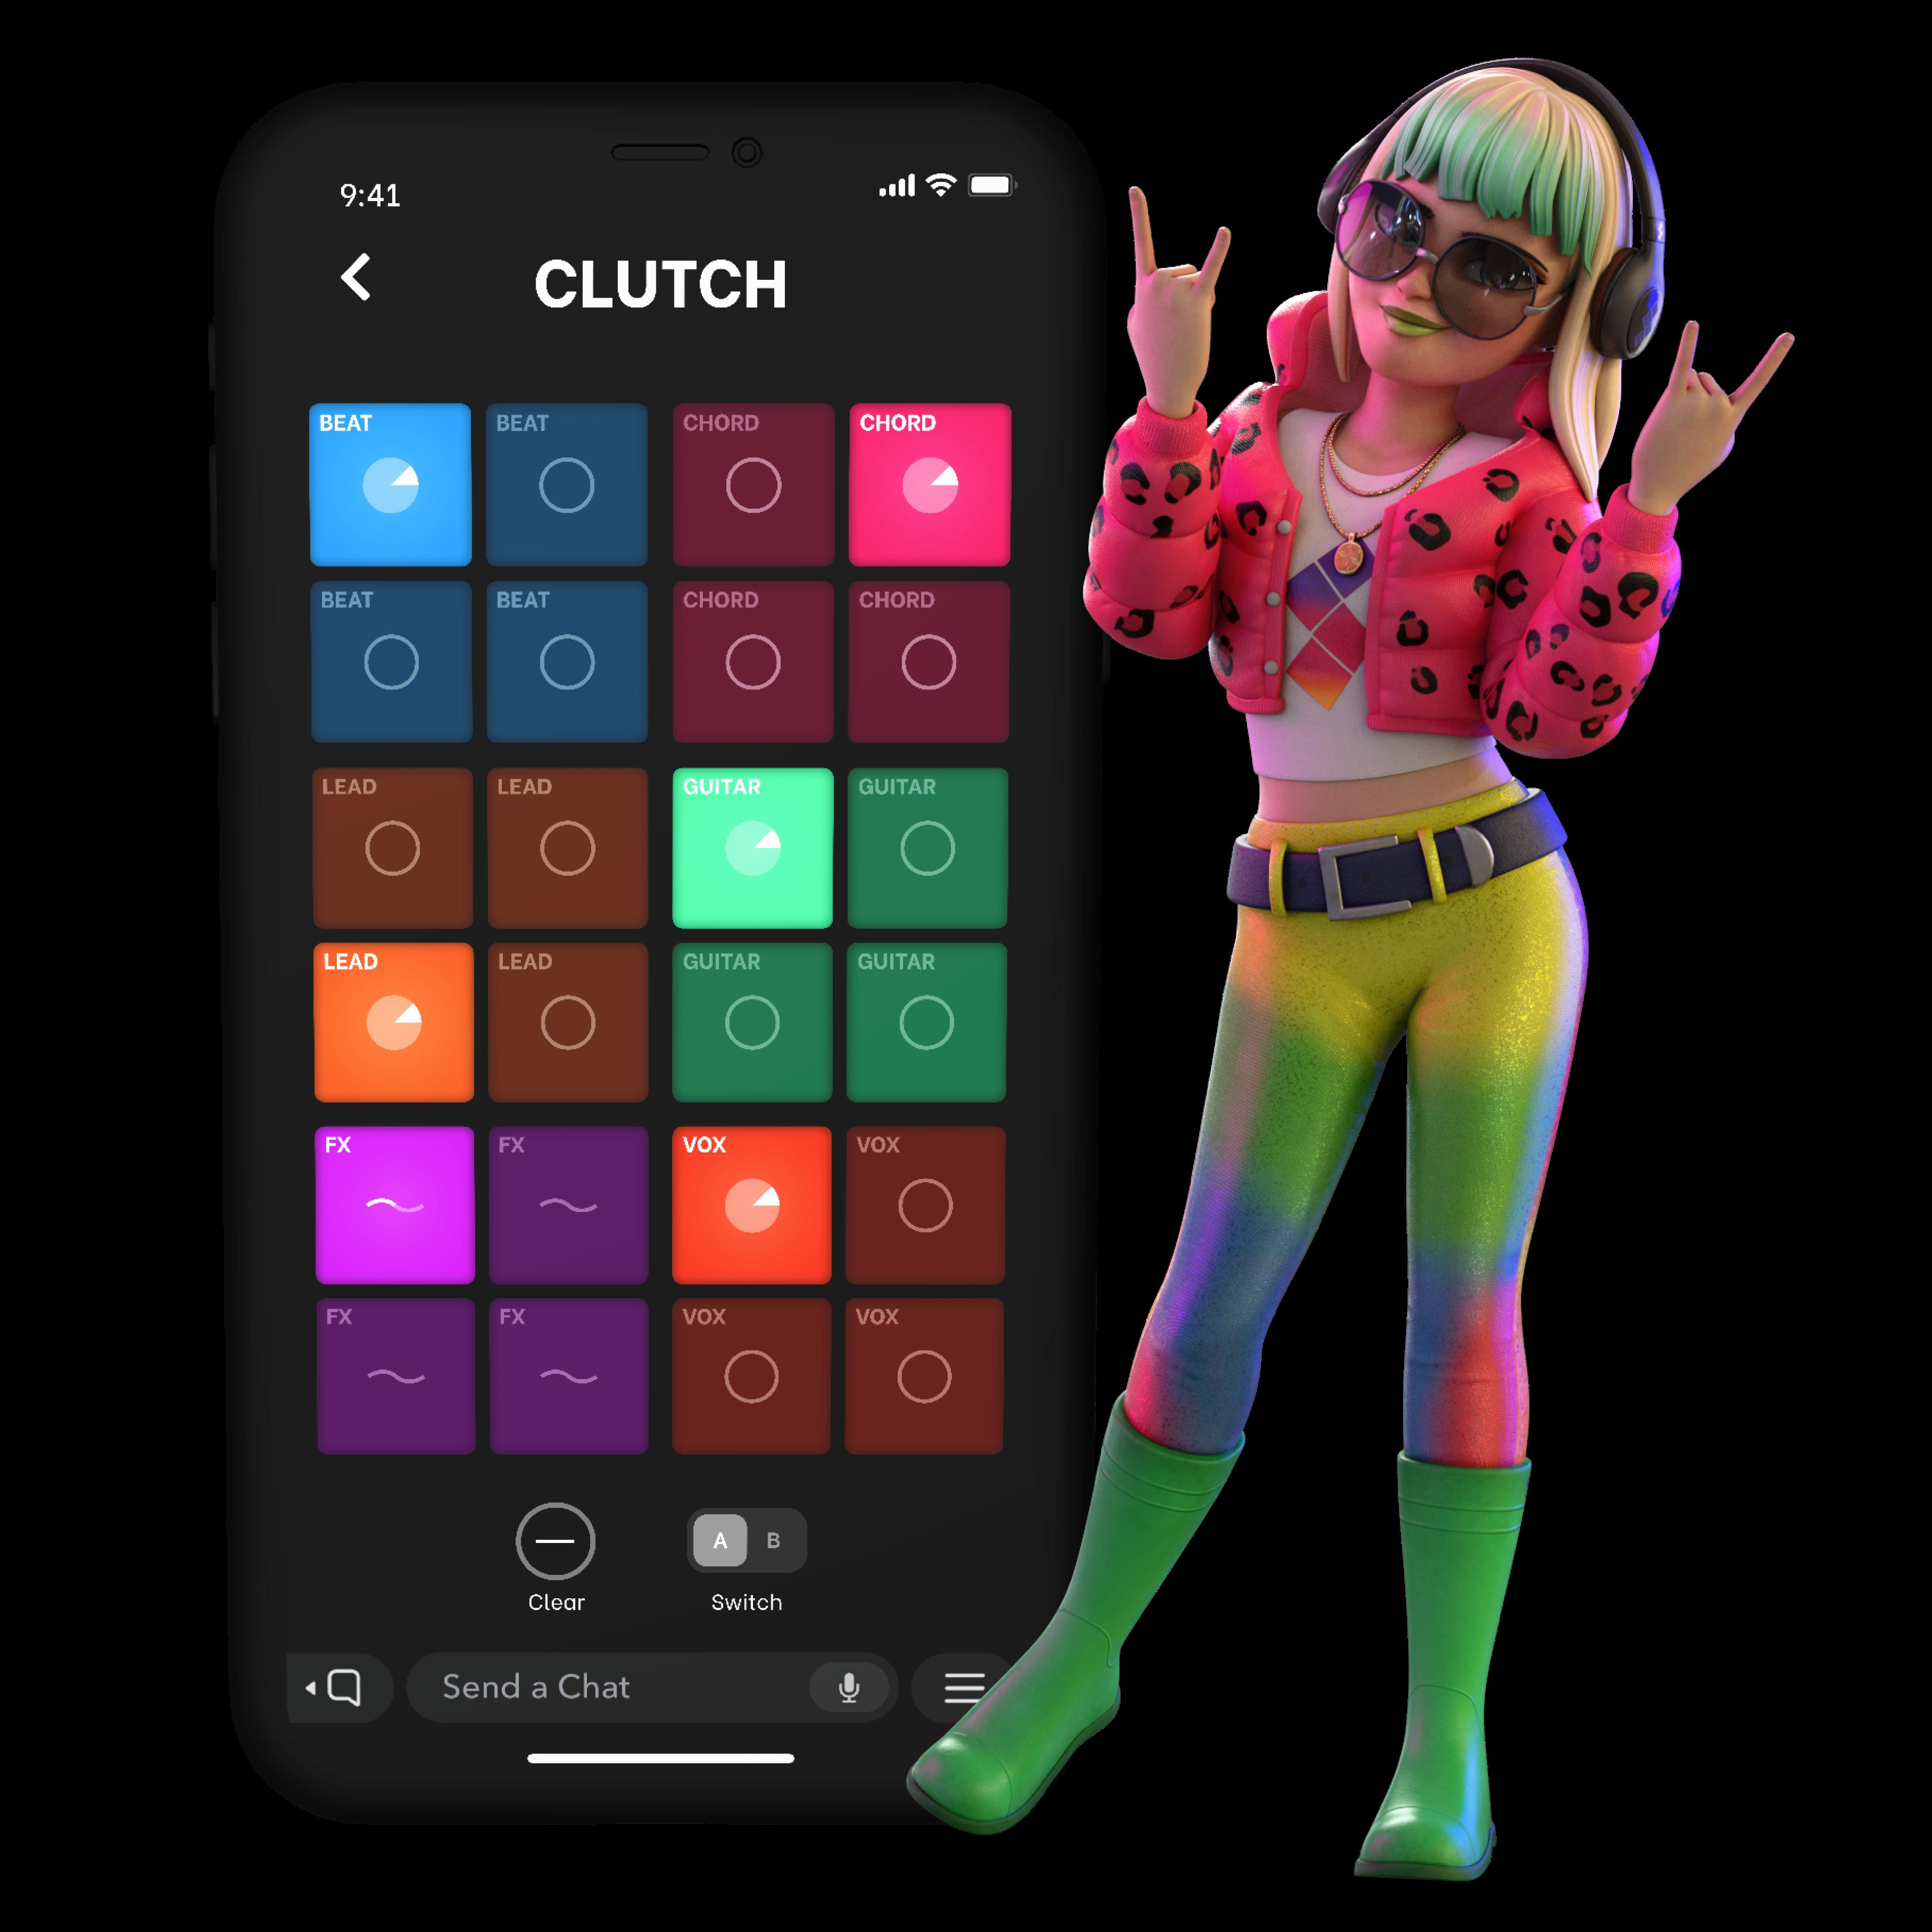 The Dubstech Protothon Wordmark 2020